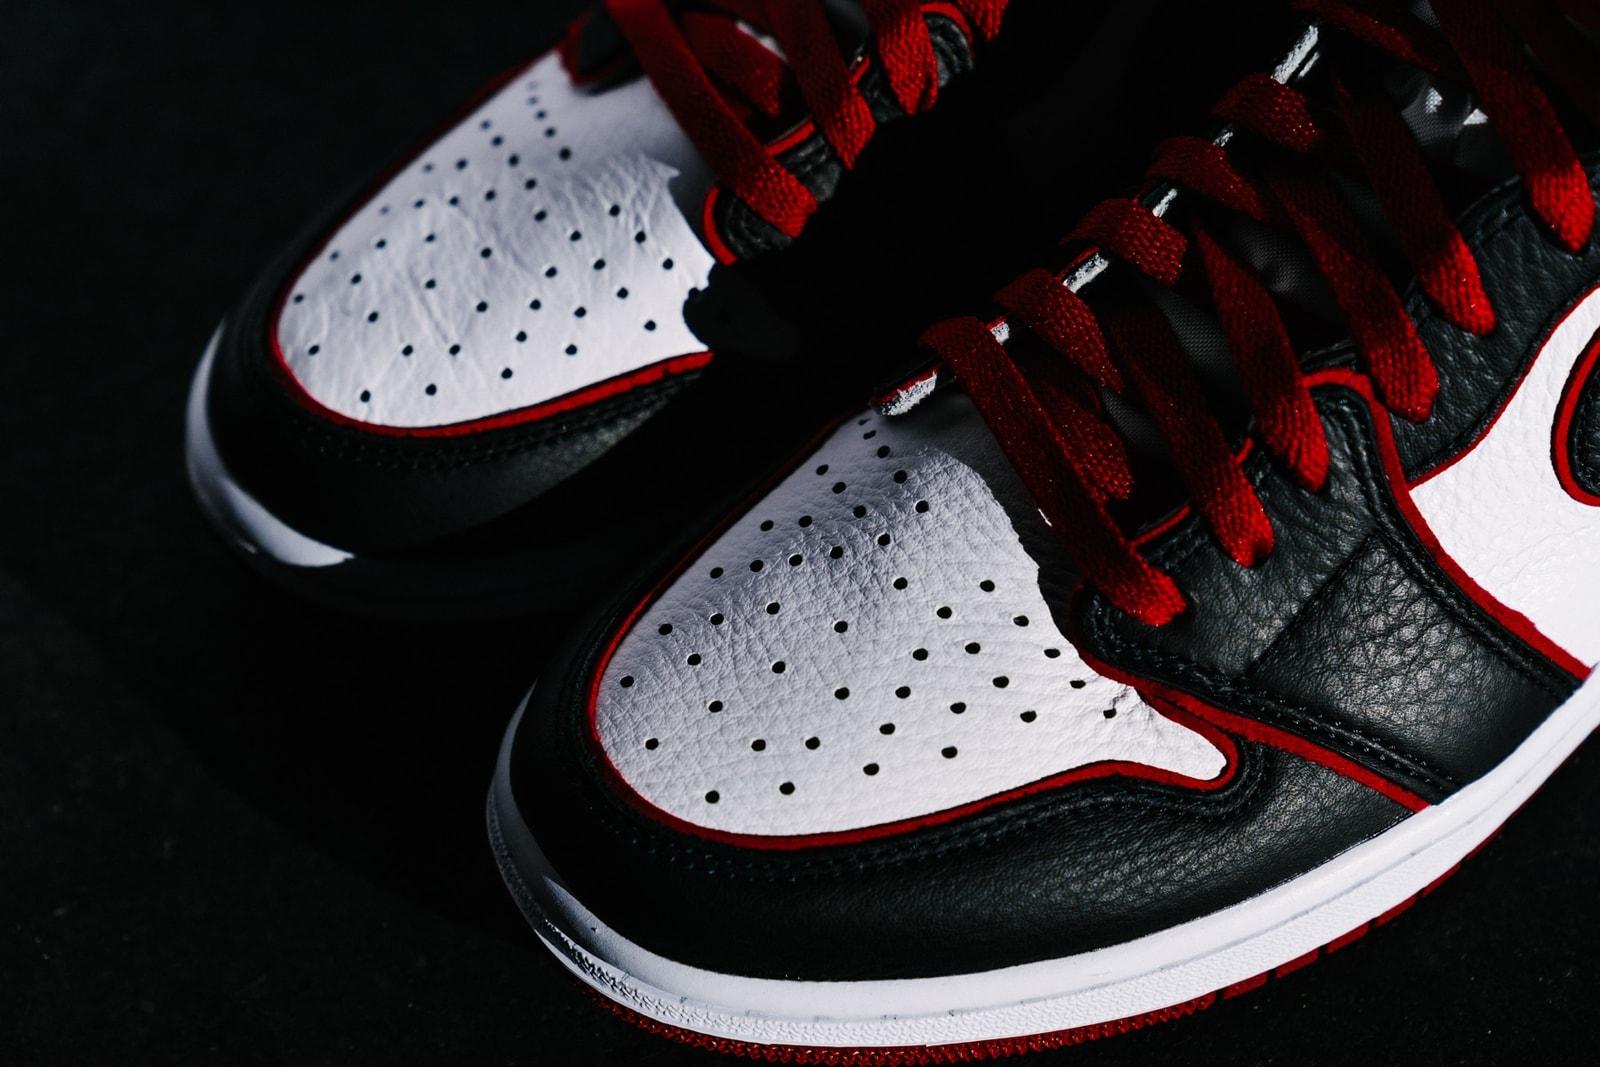 Jordan Brand 發佈假日季度 Air Jordan 1「Fearless Ones」系列